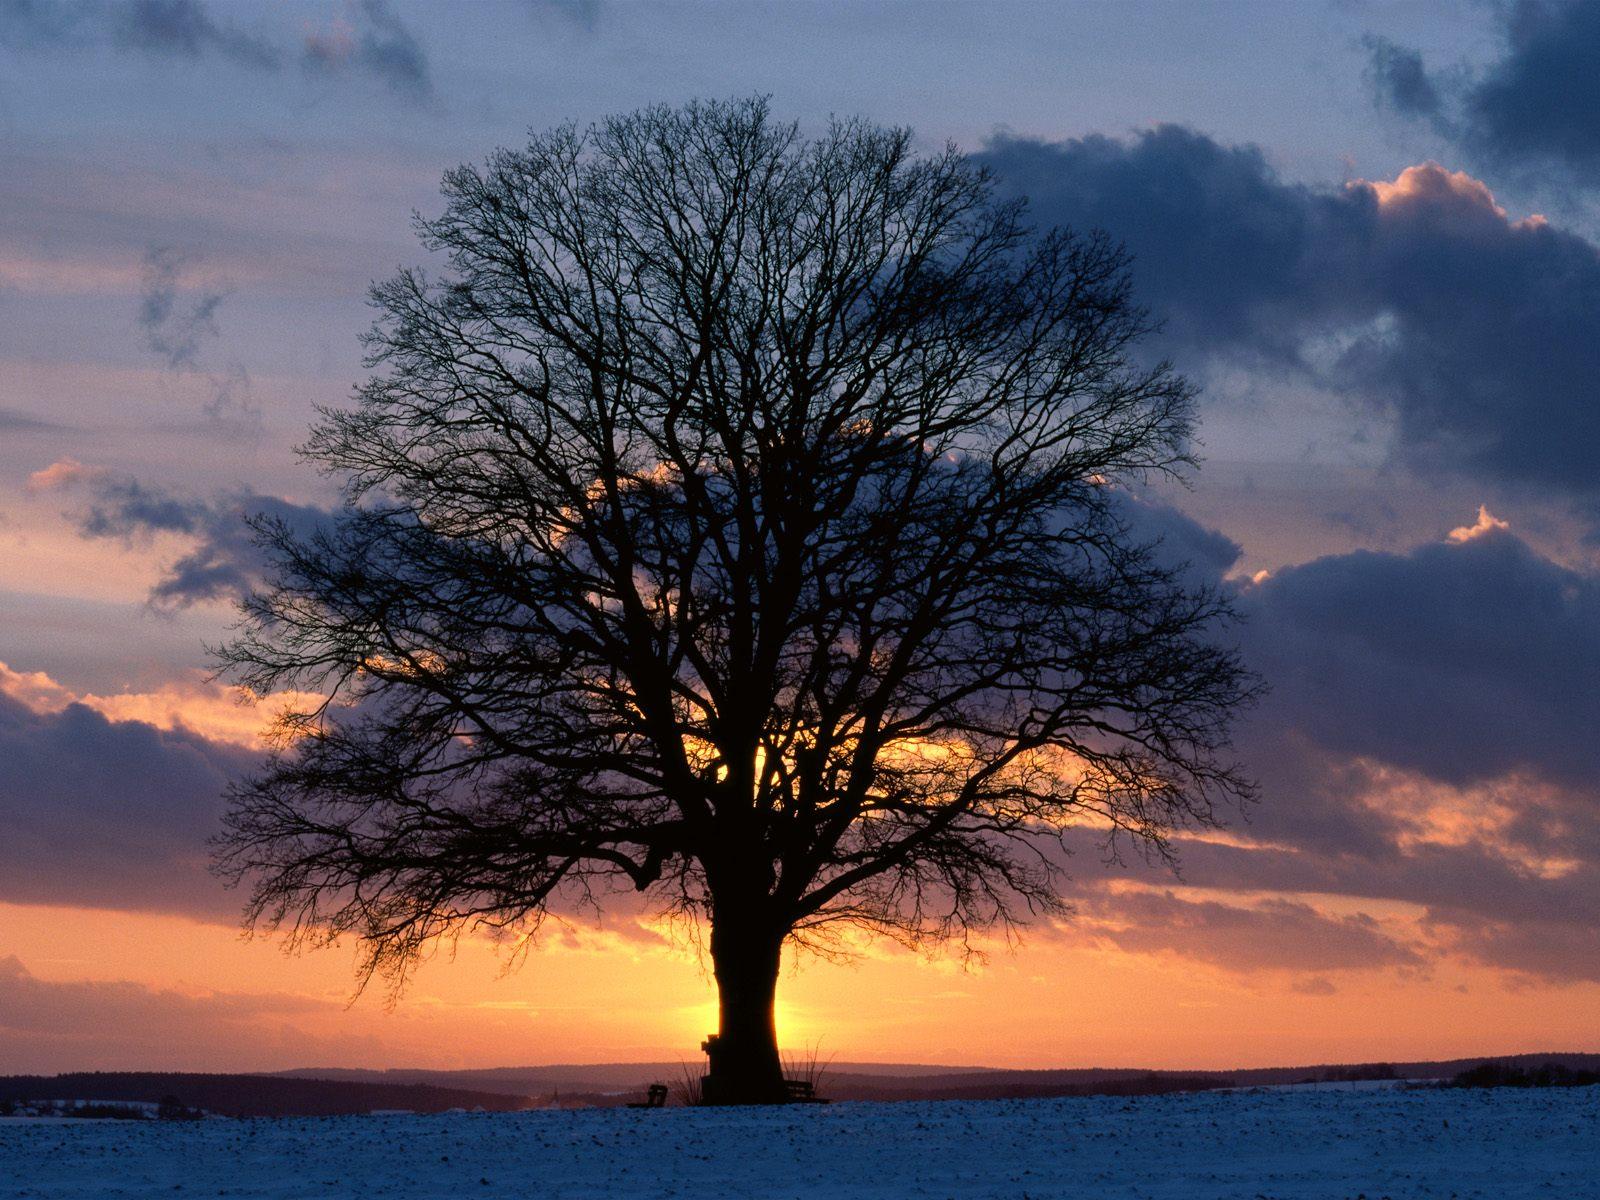 yalnız ağaç resmi